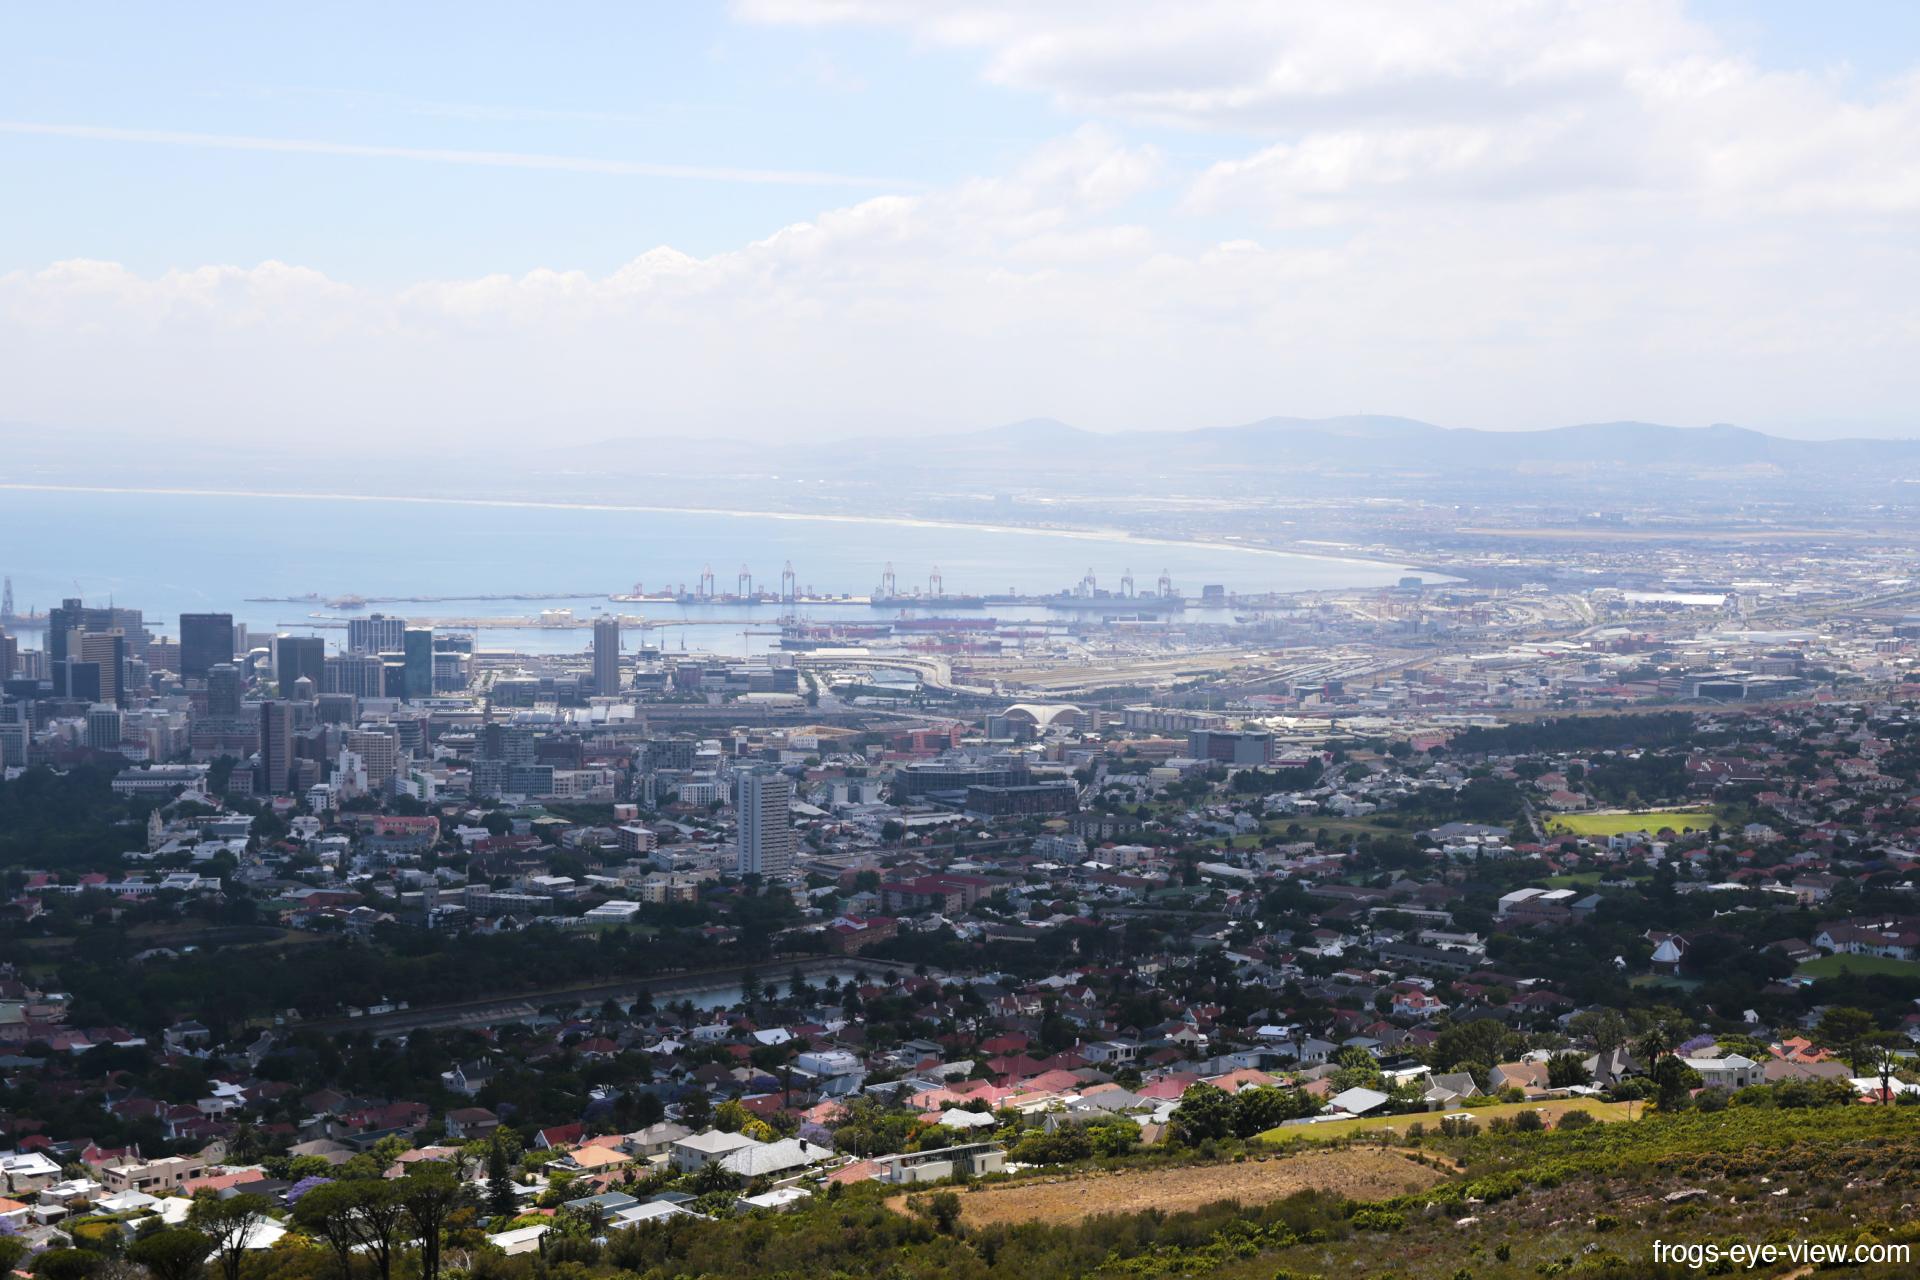 20160115_Afrika_151109-03_Capetown_MG_8238 Kopie